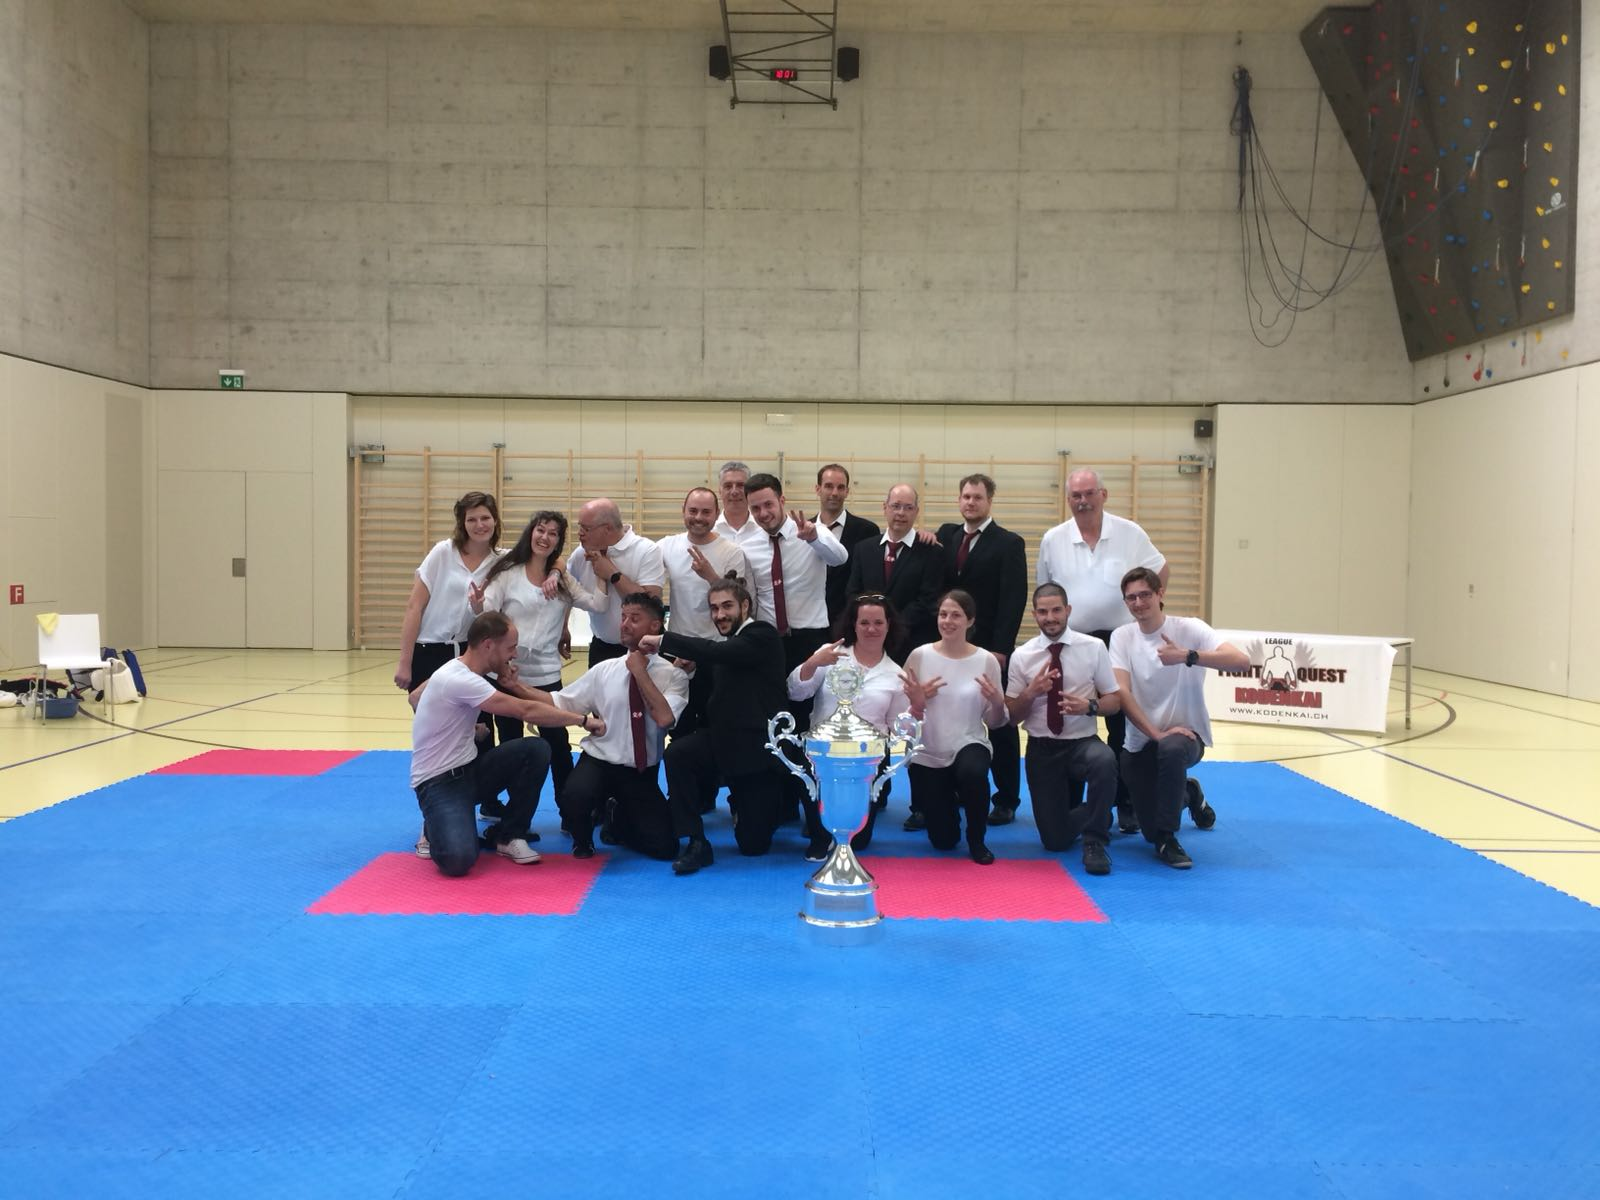 Kodenkai Karate Club Valais 2018-102